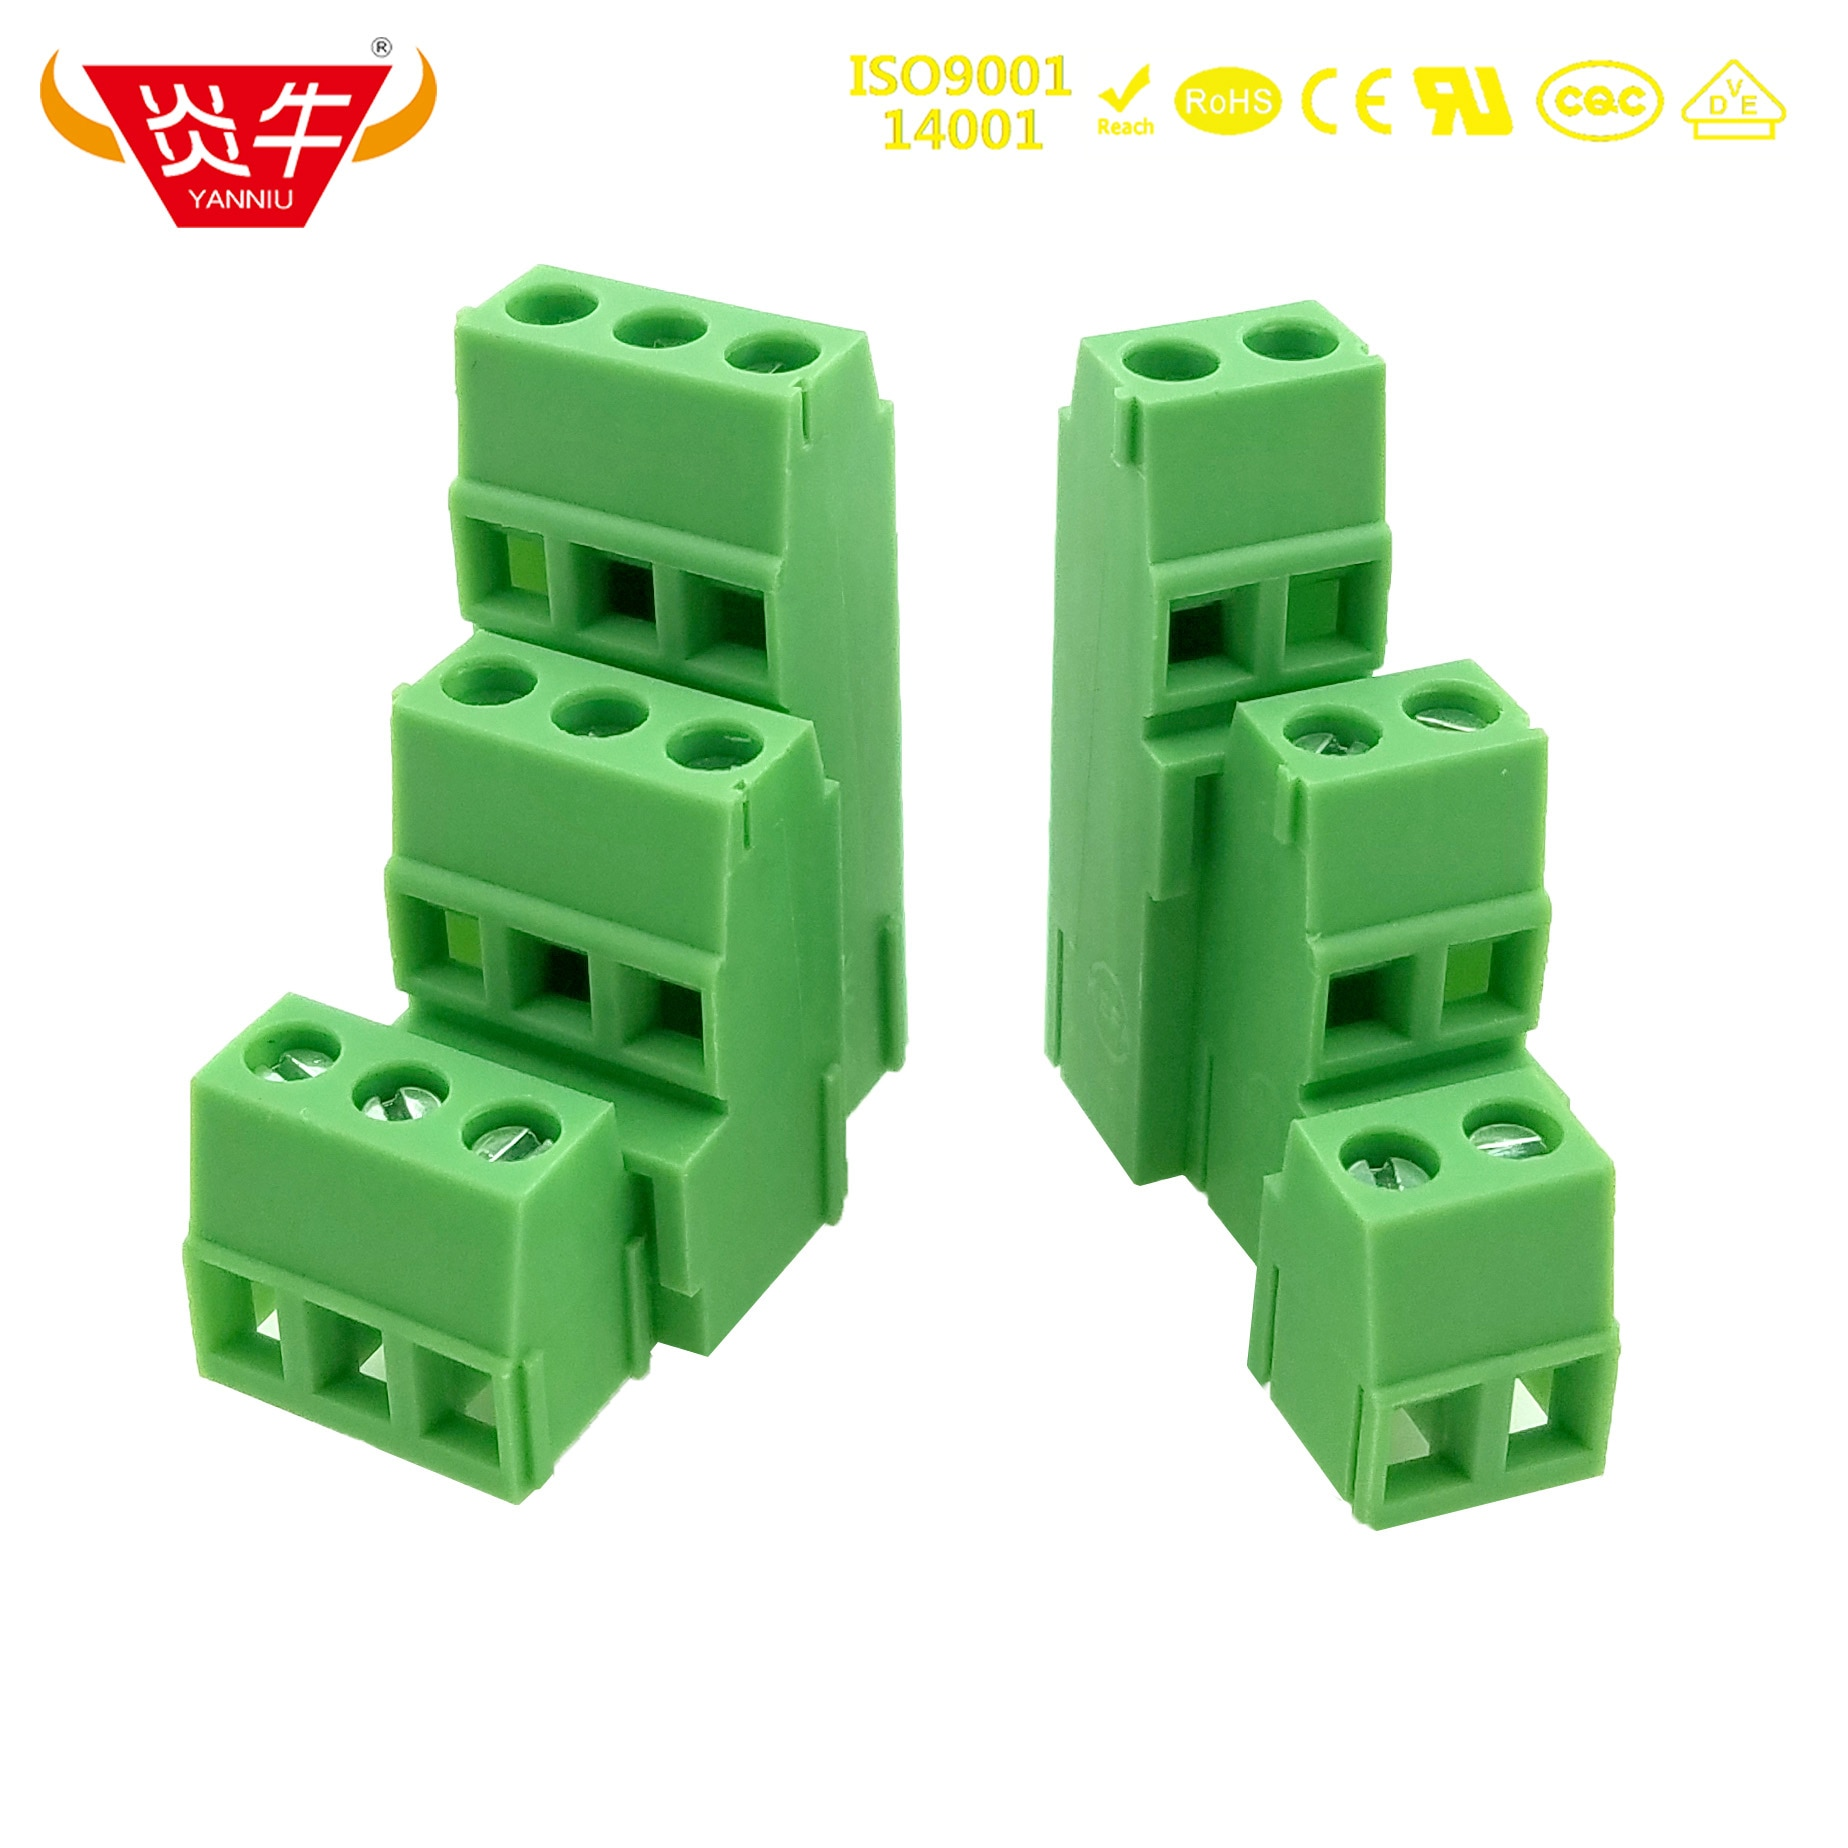 KF128A3 128A3 5.0mm 2P 3P PCB UNIVERSAL SCREW TERMINAL BLOCKS DG500A3 2PIN 3PIN MK3DS 1,5/ 2-5,0 PHOENIX CONTACT DEGSON KEFA